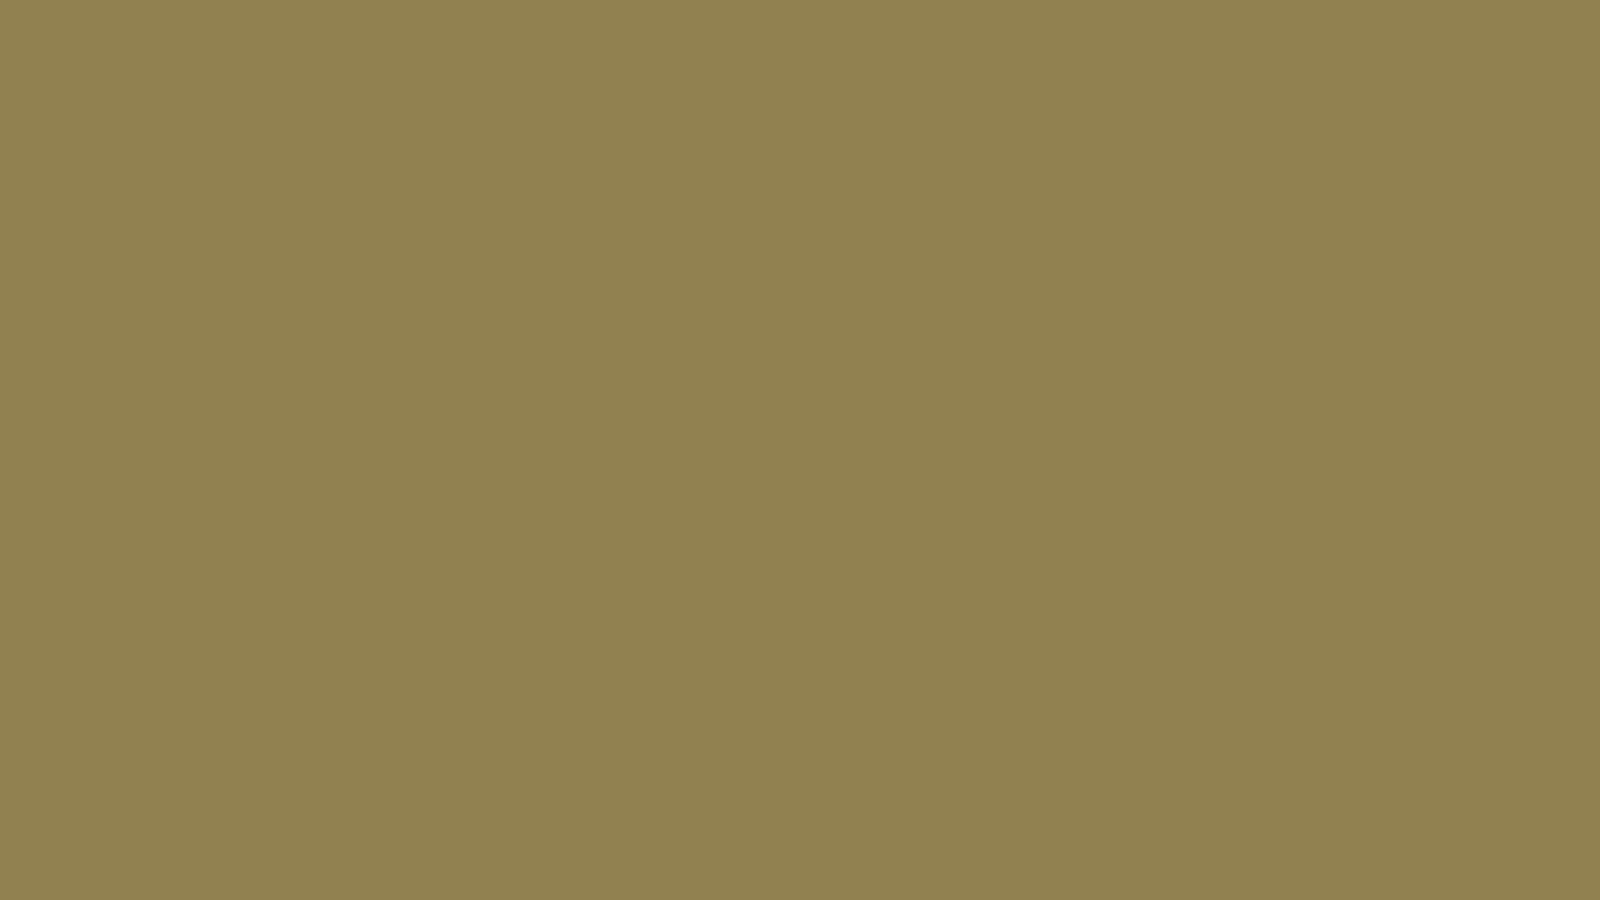 1600x900 Dark Tan Solid Color Background